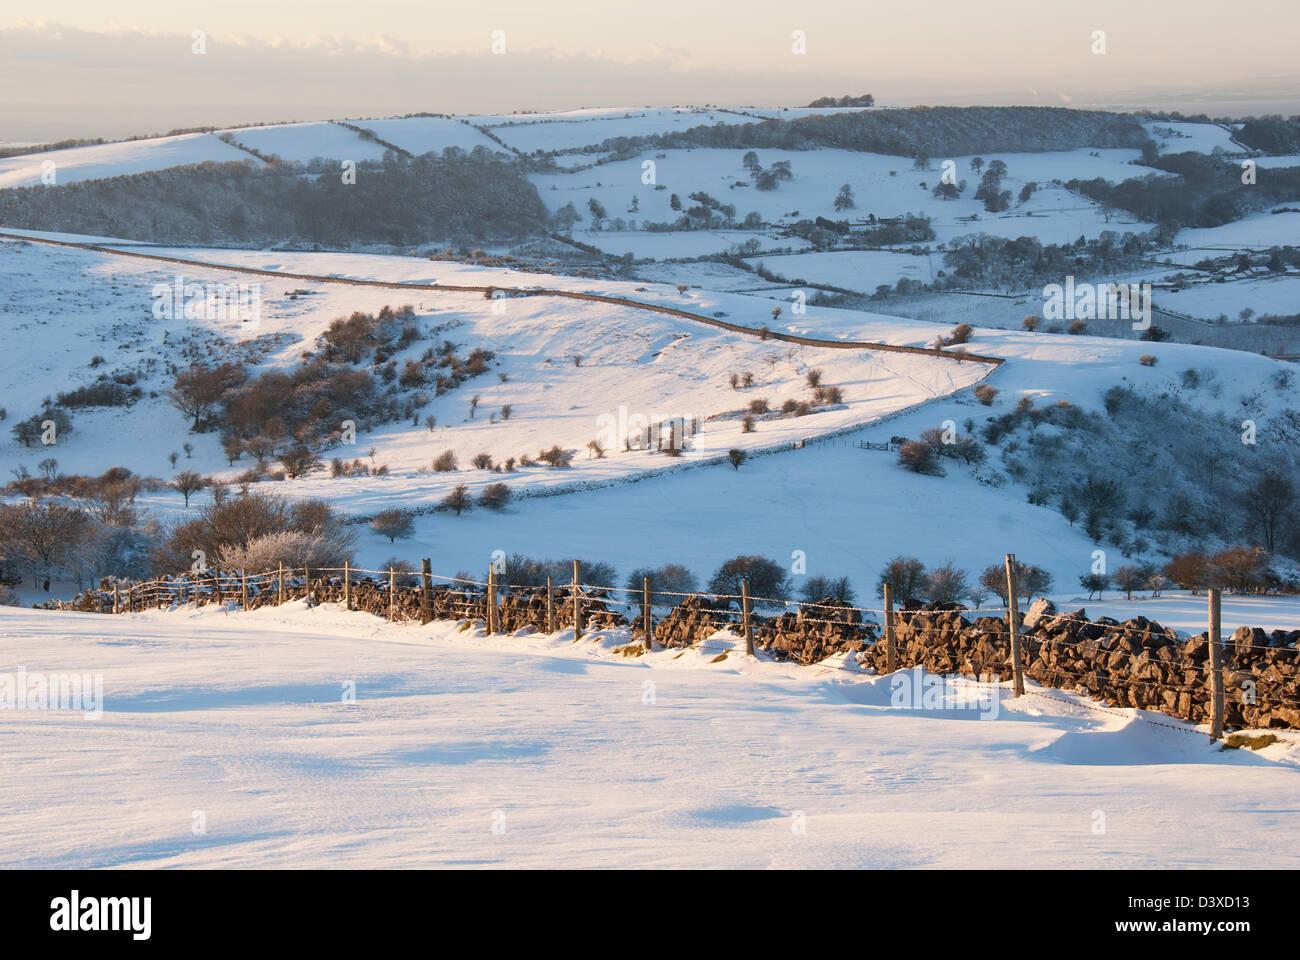 Stone wall and snowdrift, England, United Kingdom, Europe - Stock Image